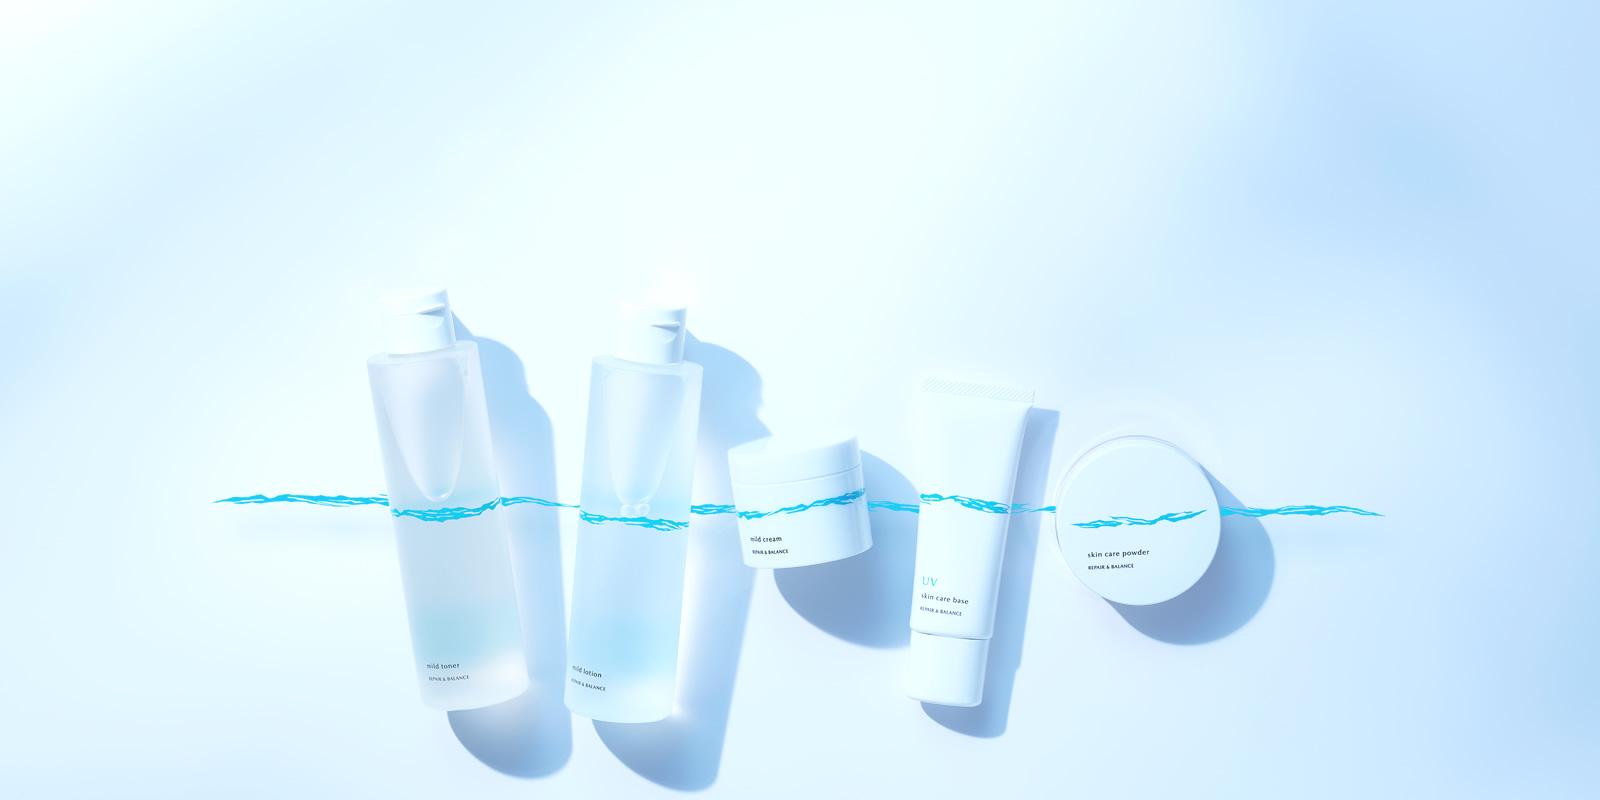 Meishoku Repair & Balance Skin Care UV Base SPF49 PA+++